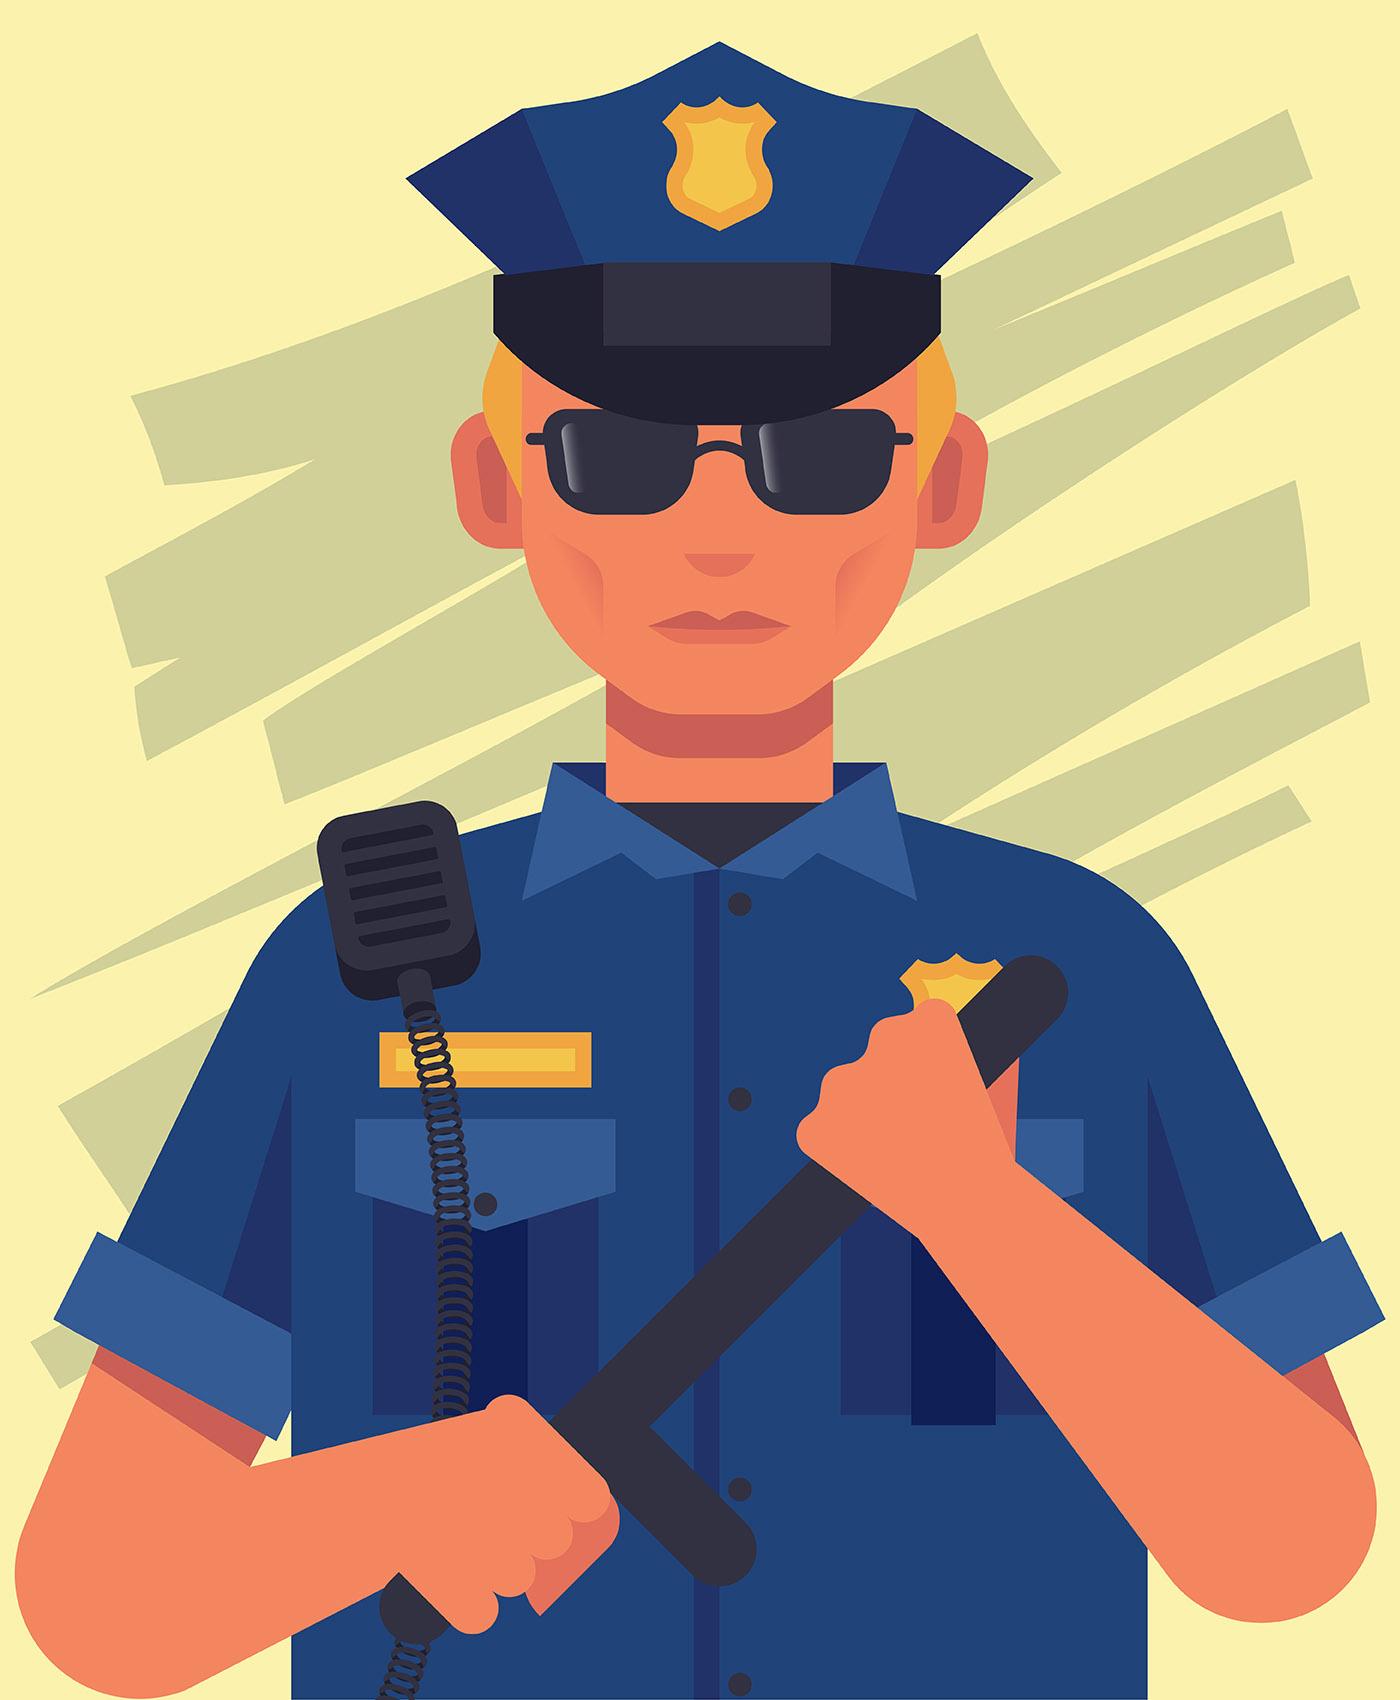 Police Officer Illustration